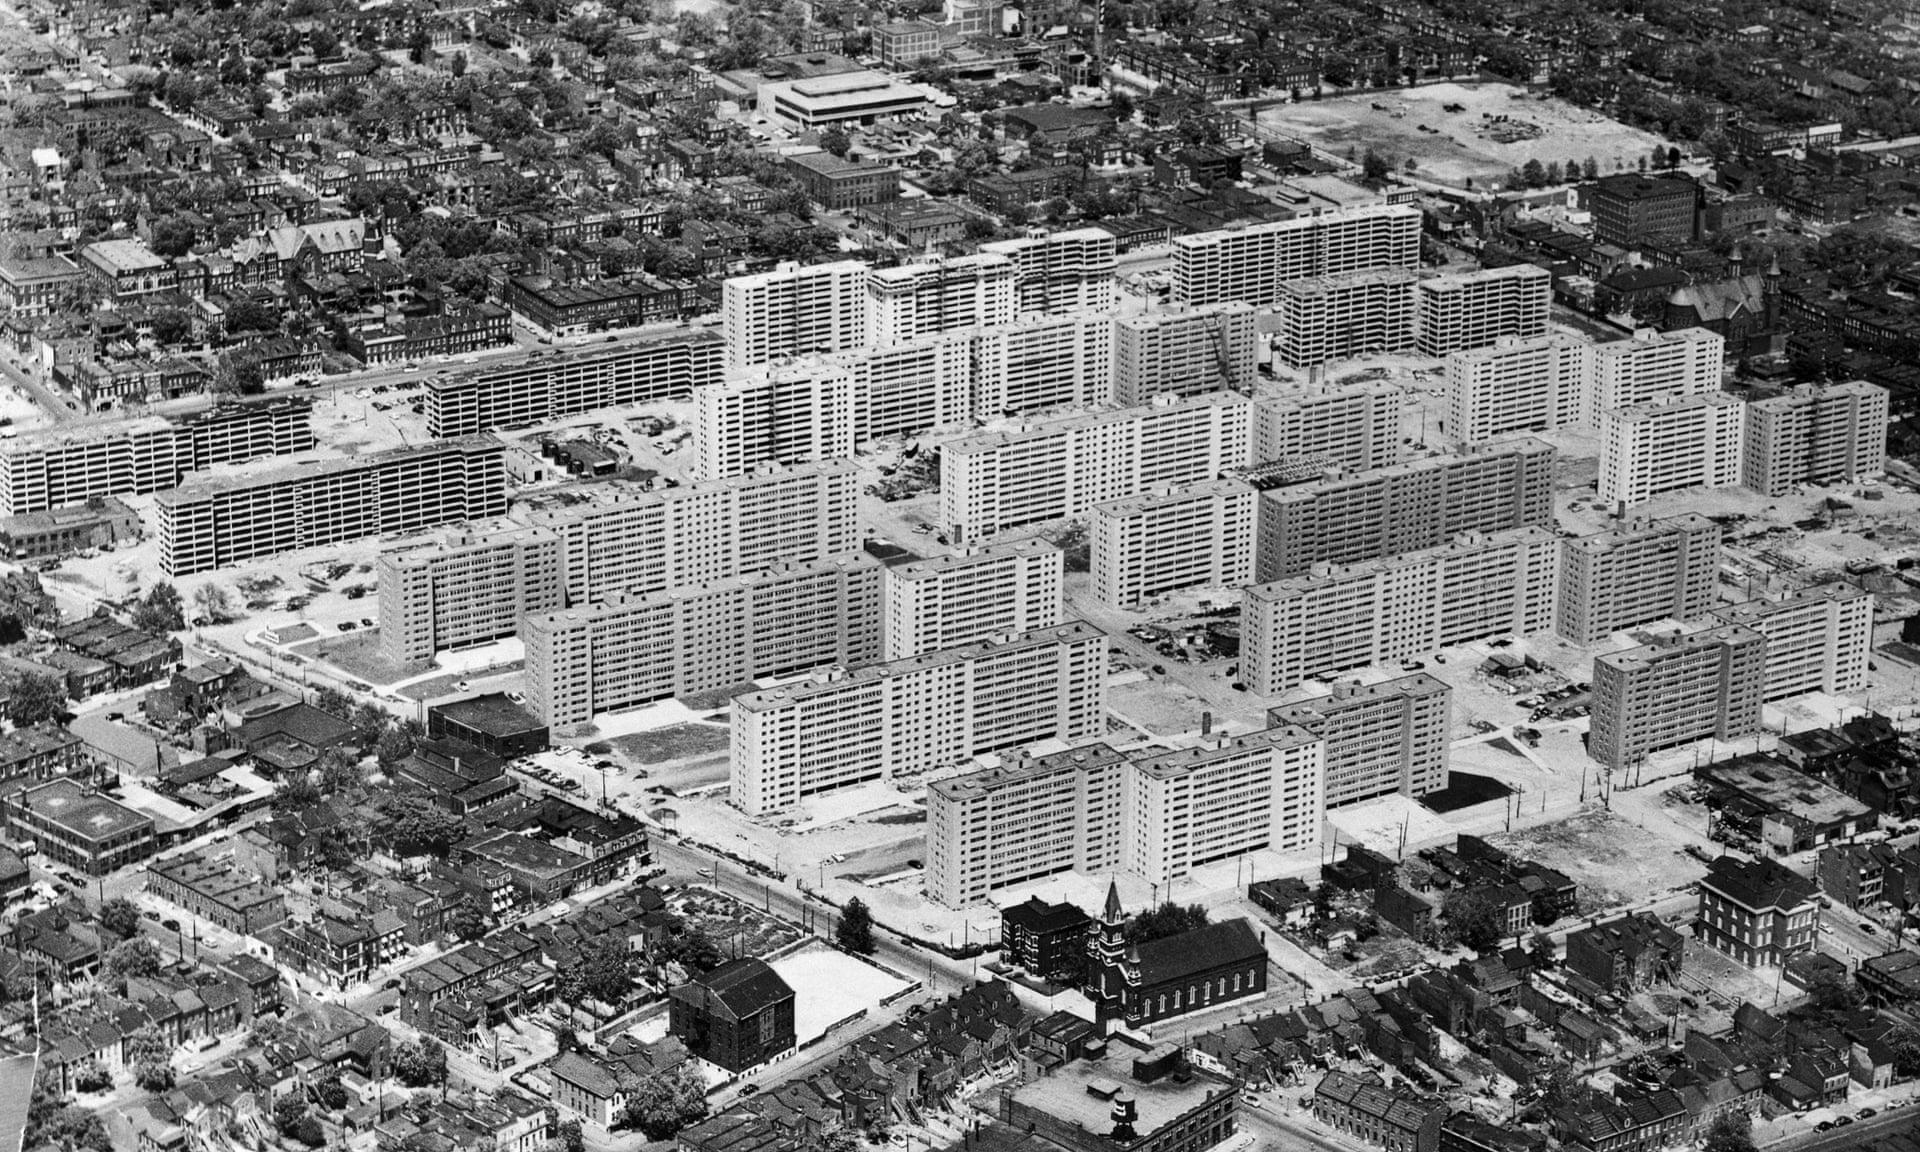 Pruitt building before it was demolished